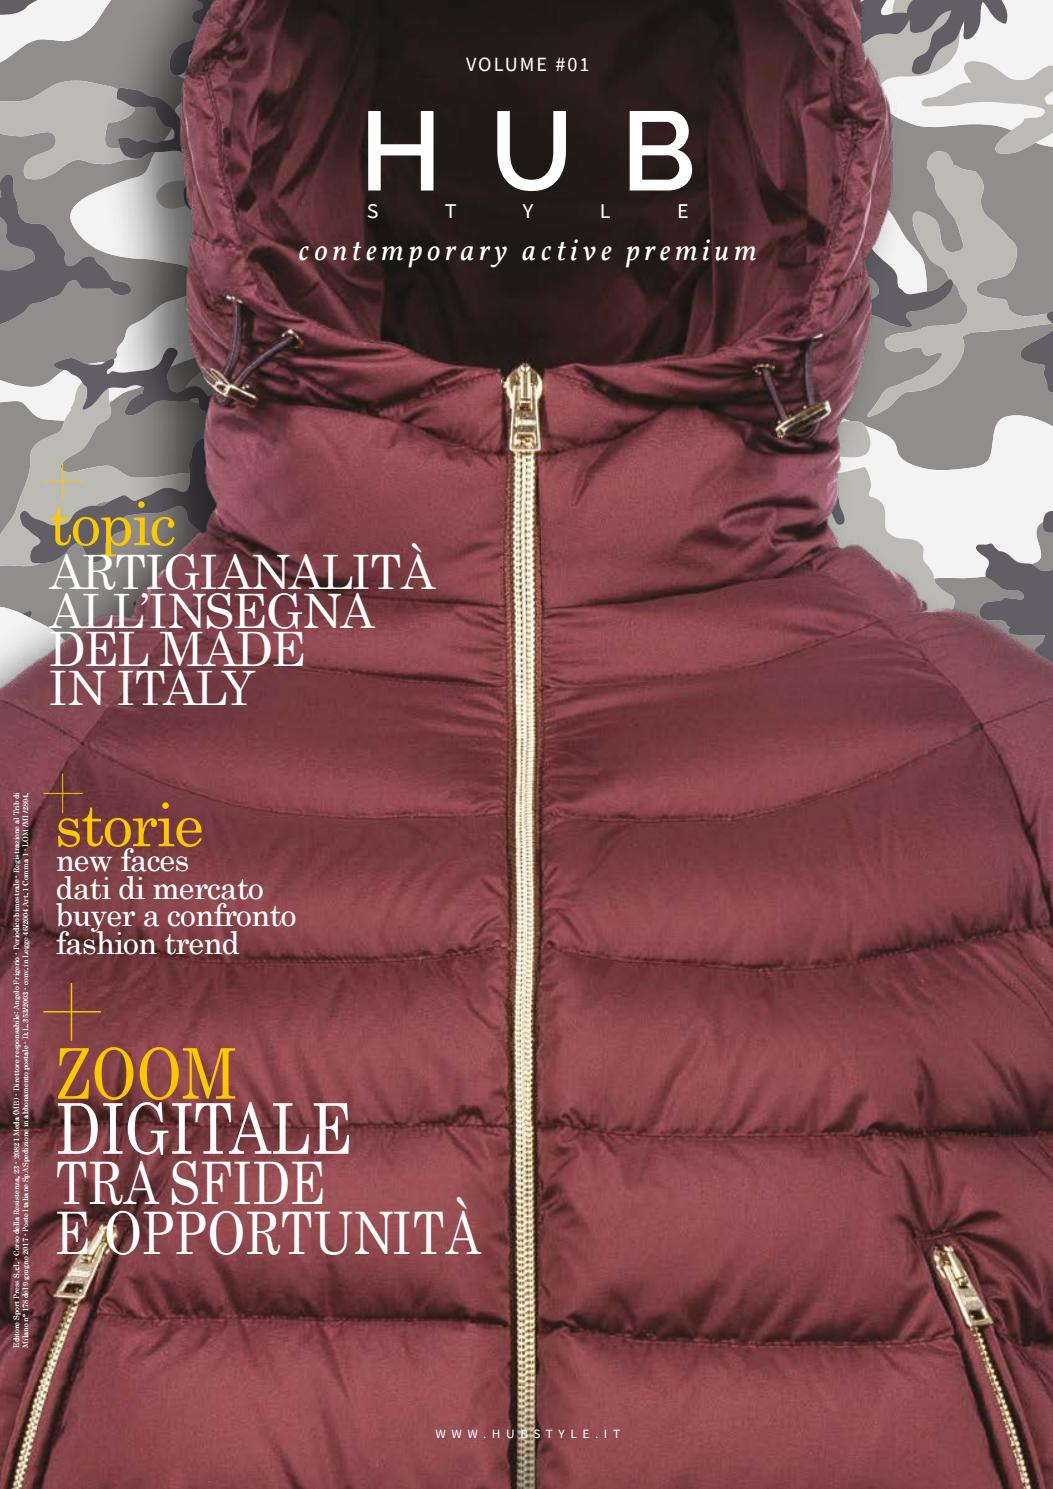 HUB Style Magazine Vol. 1 by Sport Press issuu